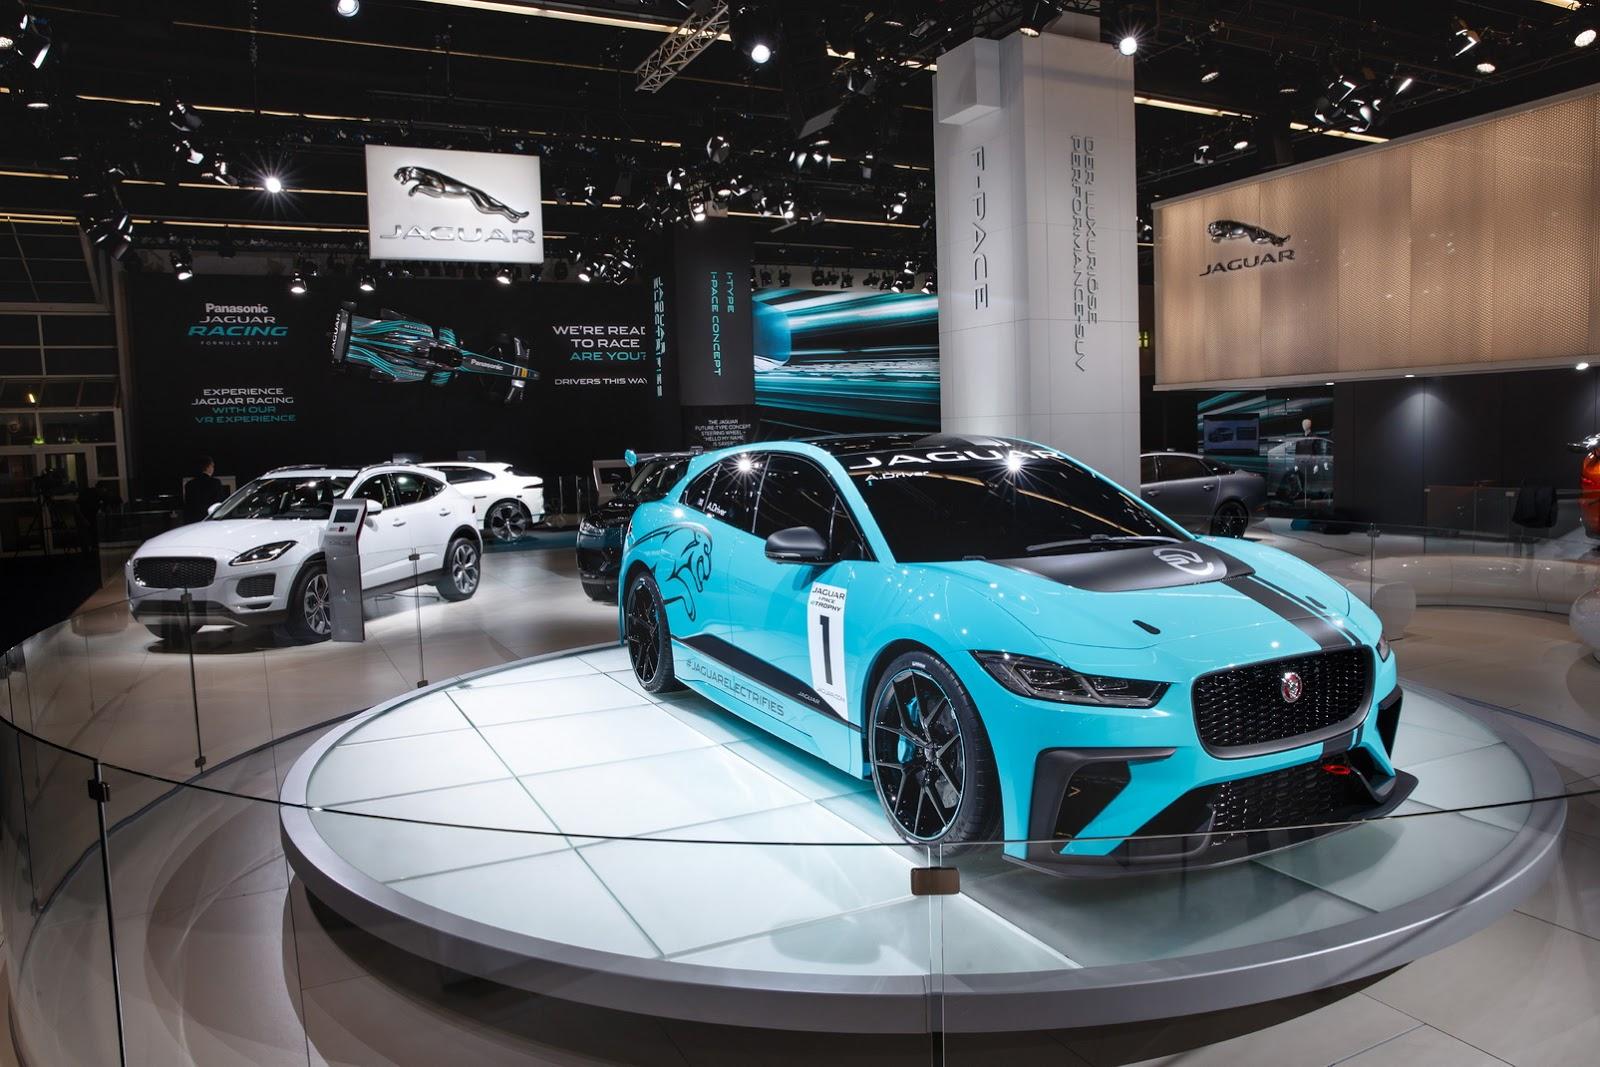 jaguar-ipace-race-car-iaa-7